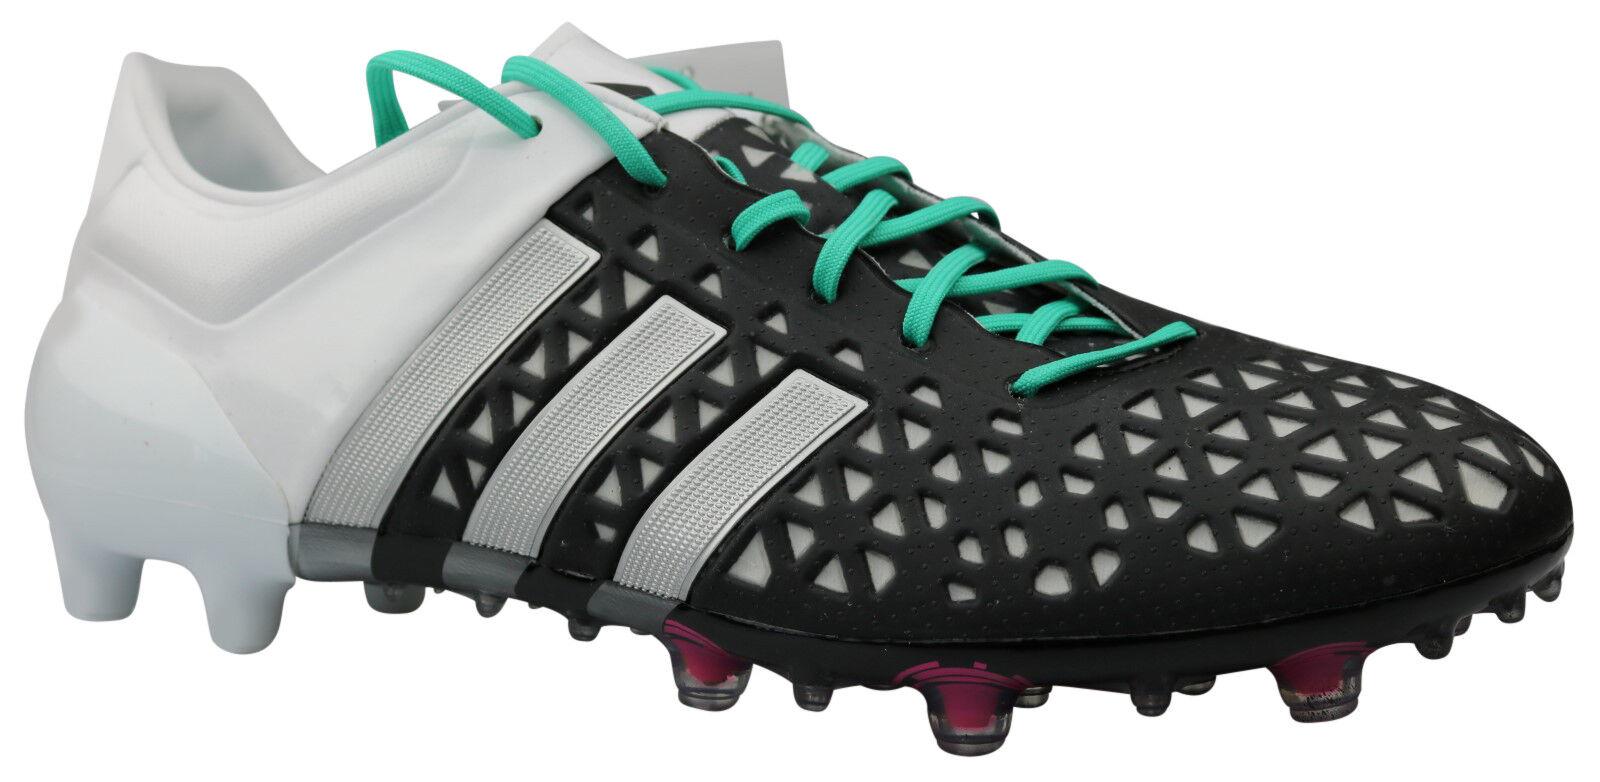 Adidas ACE 15.1 FG AG Herren Fußballschuhe Fußballschuhe Fußballschuhe AF5087 schwarz Gr. 39 - 48 NEU & OVP cdf26d